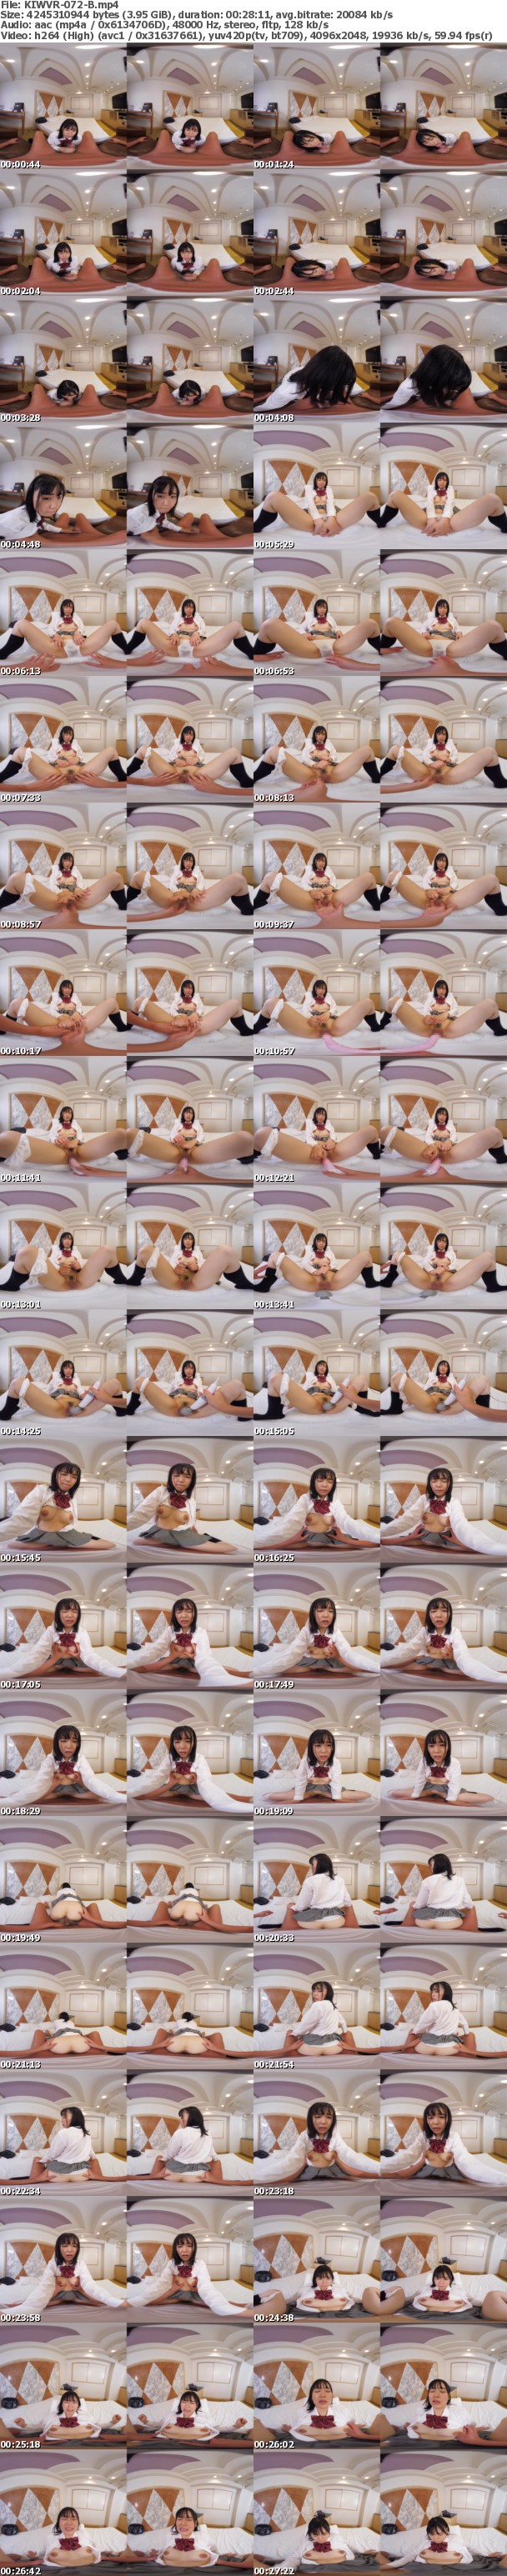 (VR) KIWVR-072 HQ超画質革命!パパ活円光!「またイッてもいいですか…」敏感体質の制服美少女とラブホでしっぽり中出し性交 琴音芽衣